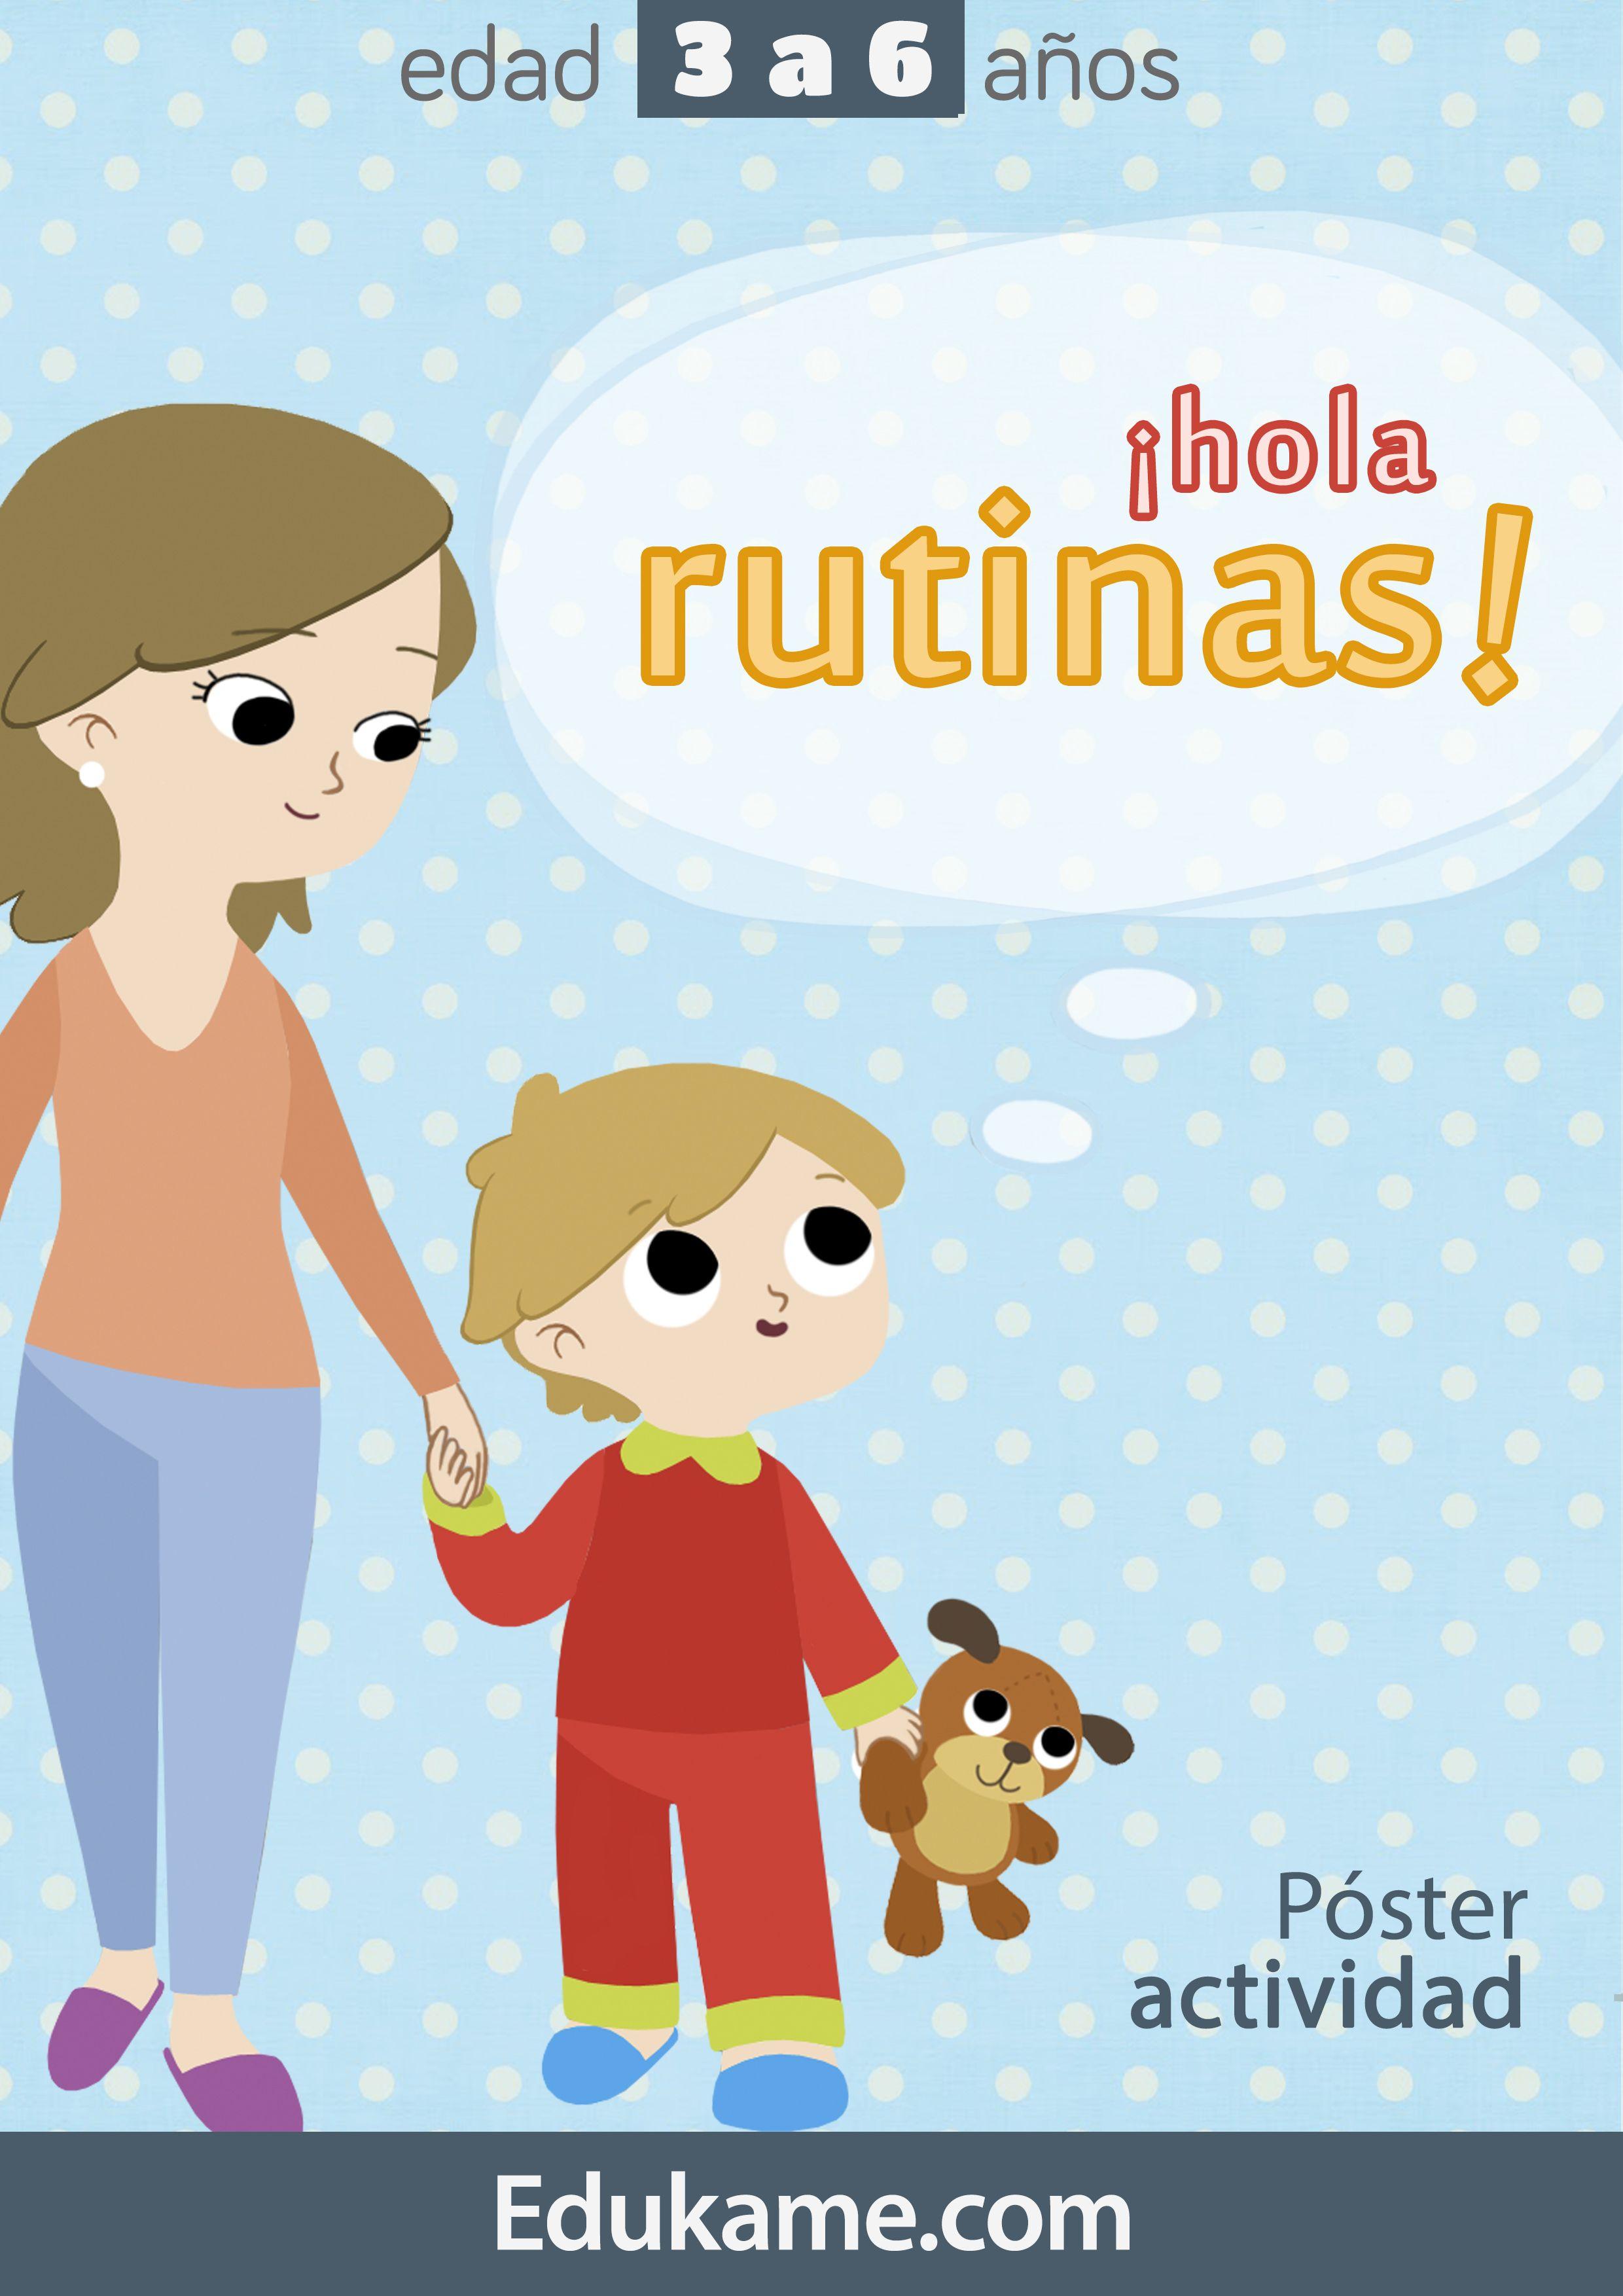 Poster Hola Rutinas Con Imagenes Actividades Educacion Emocional Infantil Rutinas